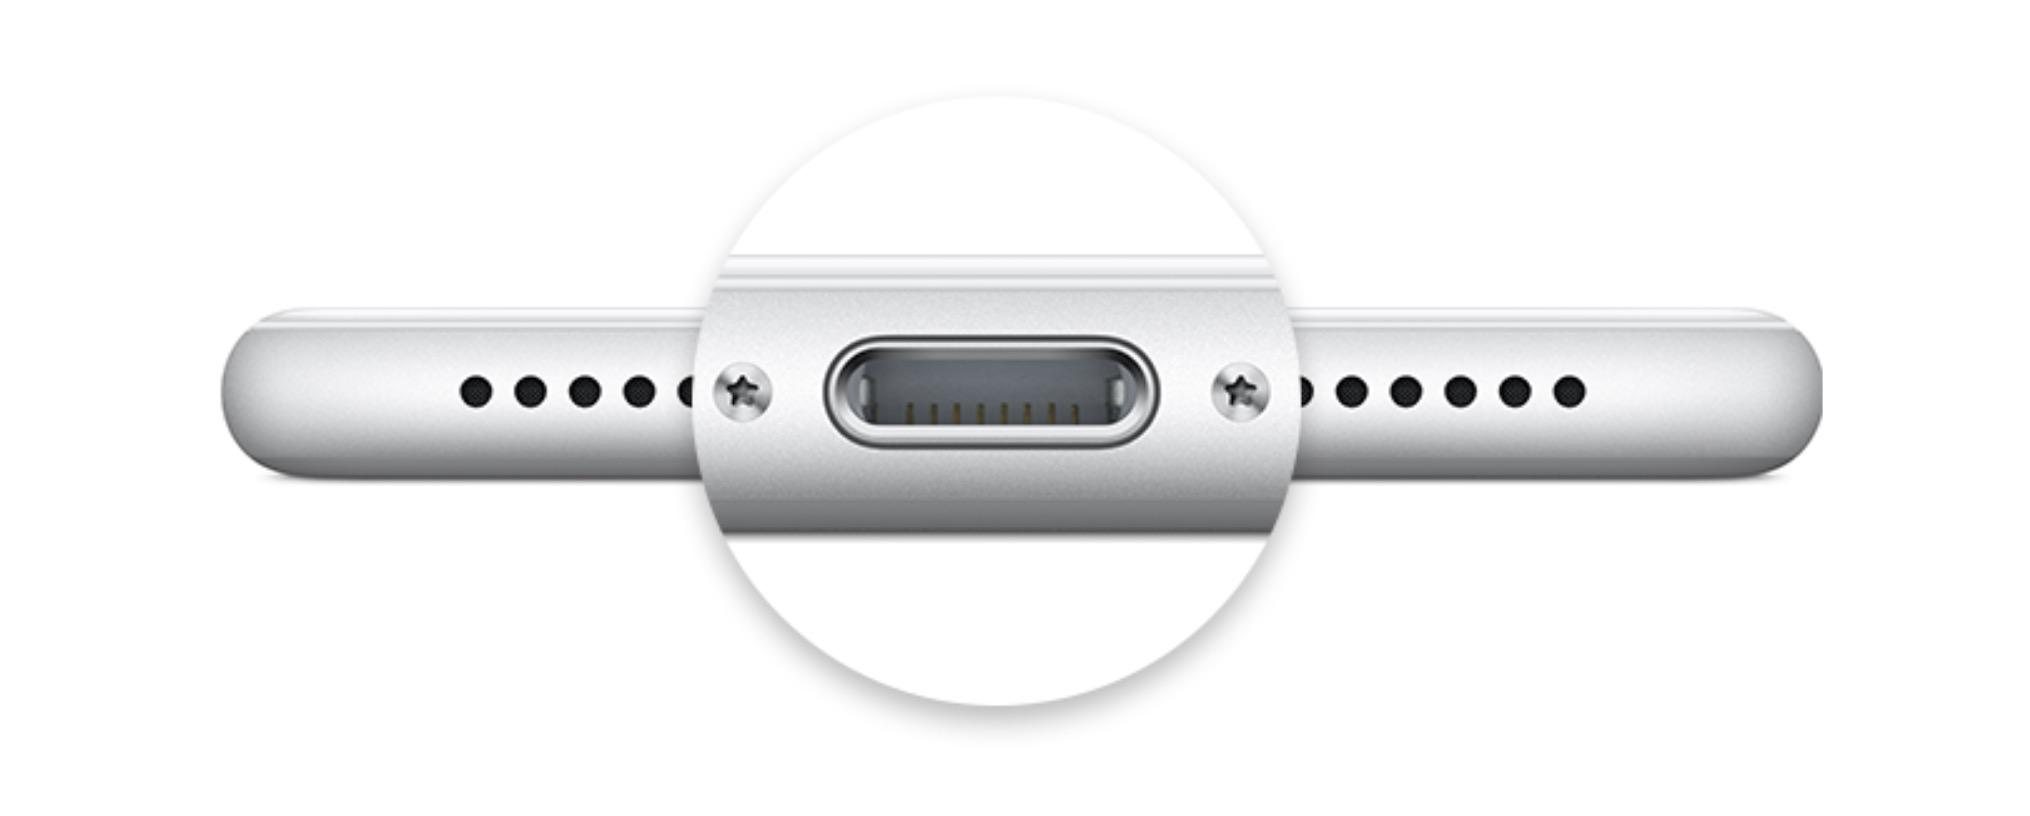 Close up image of Apple's Lightning port